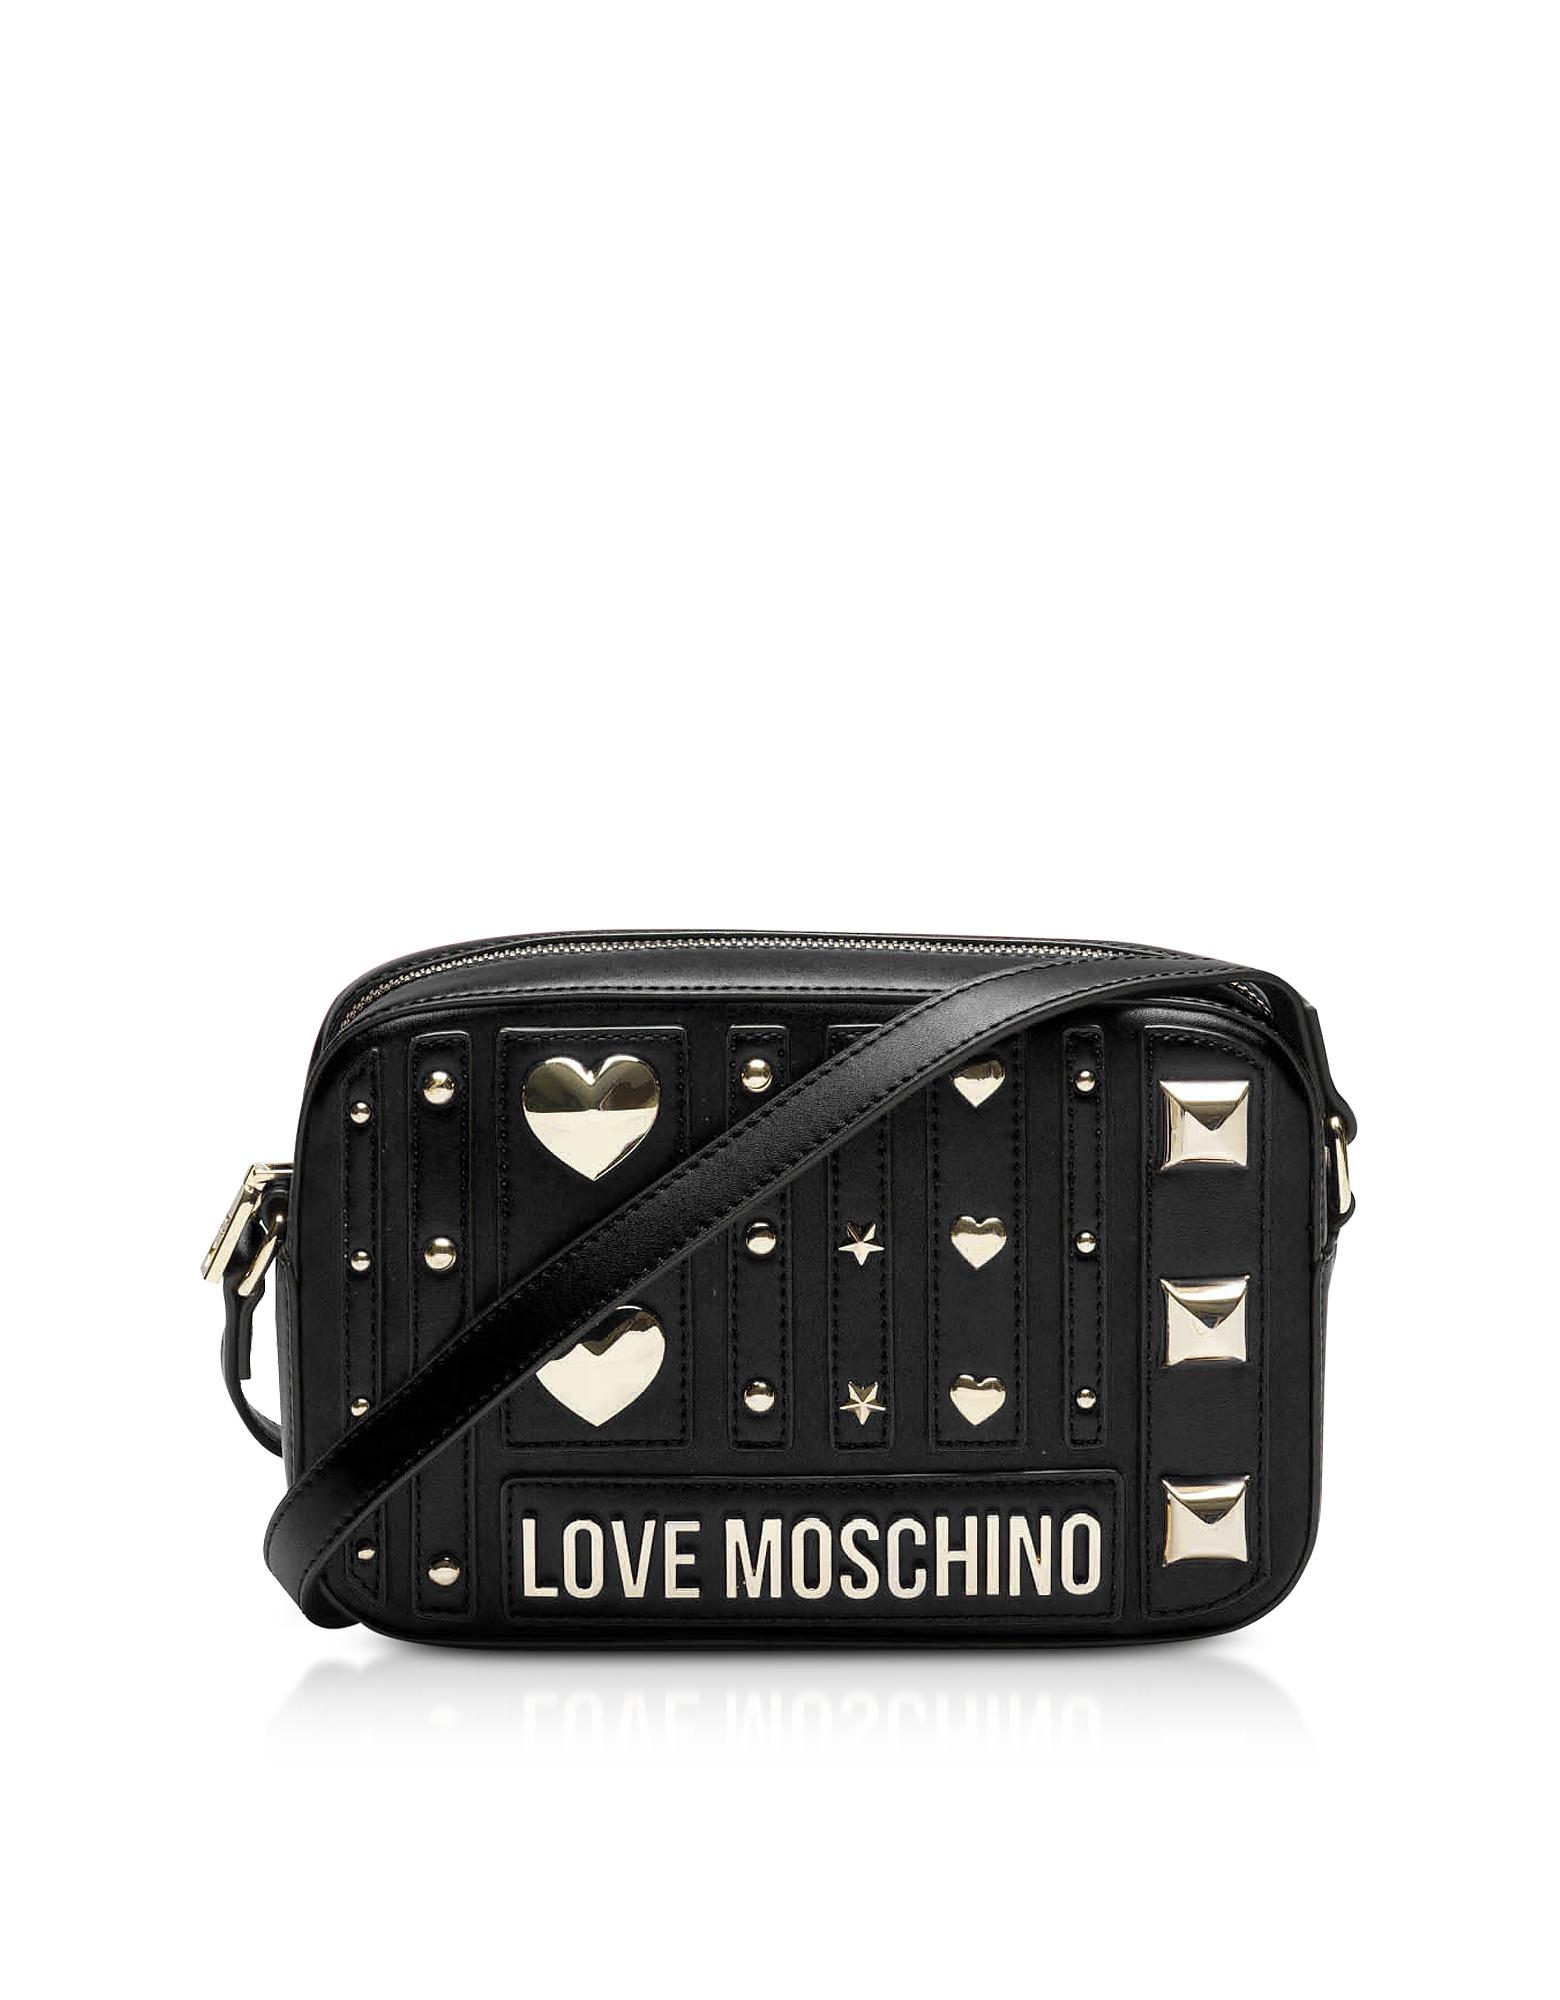 Love Moschino BLACK HEART STUDS ECO-LEATHER CAMERA BAG